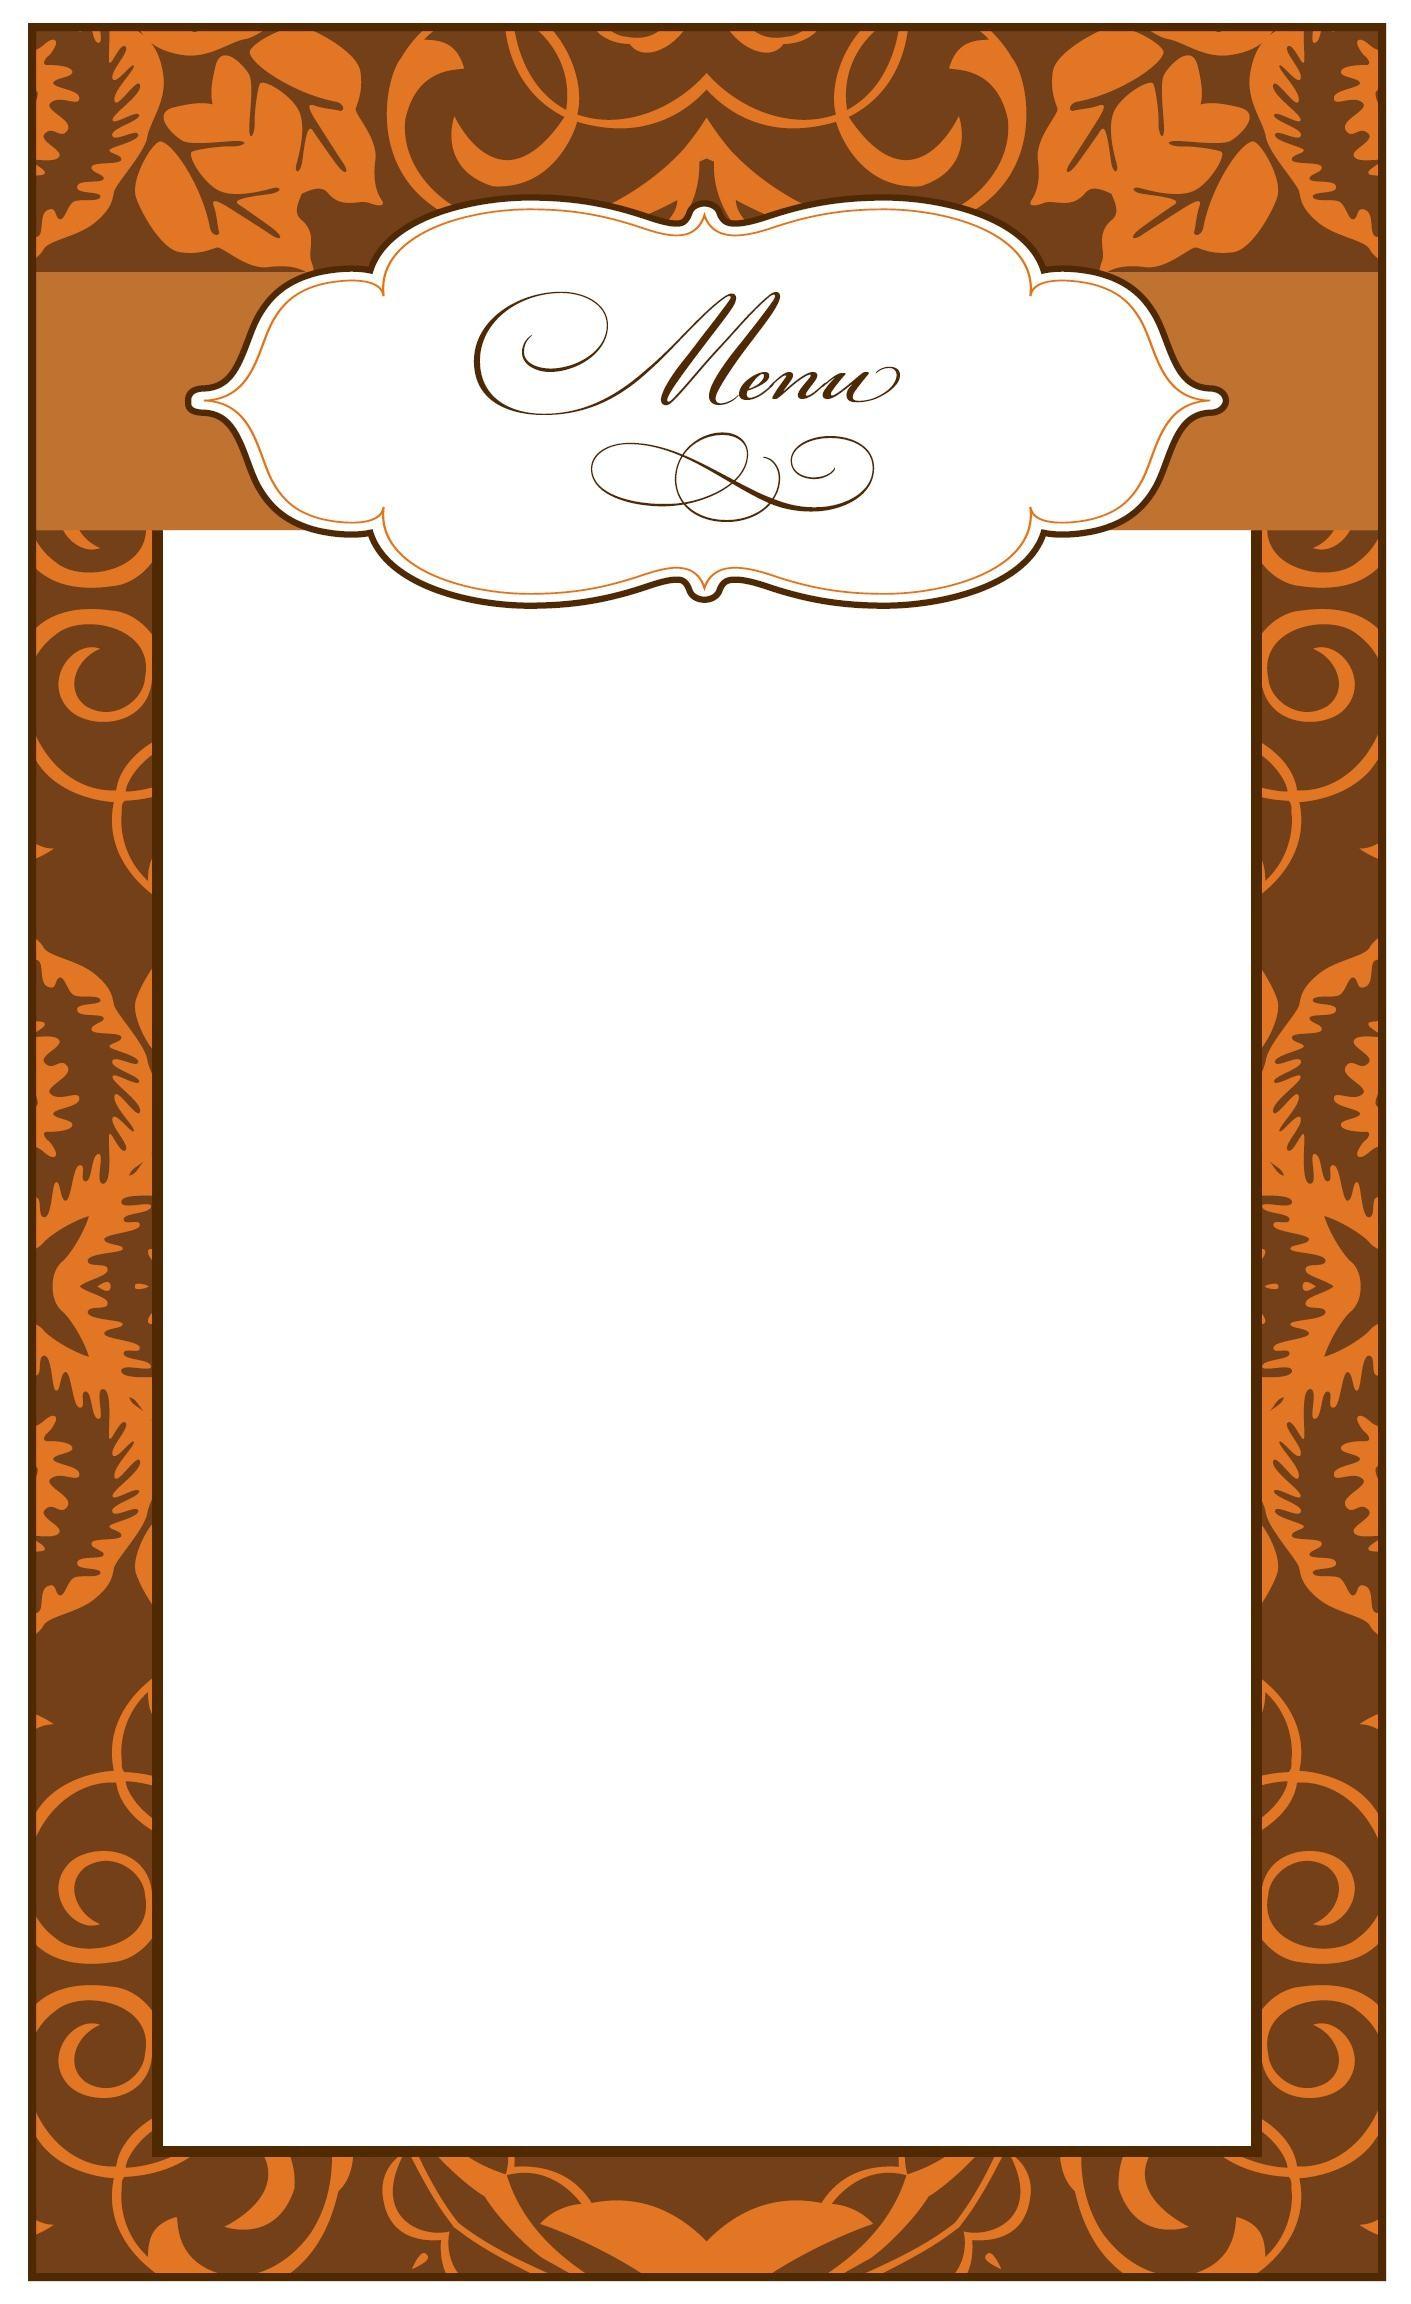 Thanksgiving Menu Template Printable Free Guide Blank Fancy Madratco - Free Printable Thanksgiving Menu Template